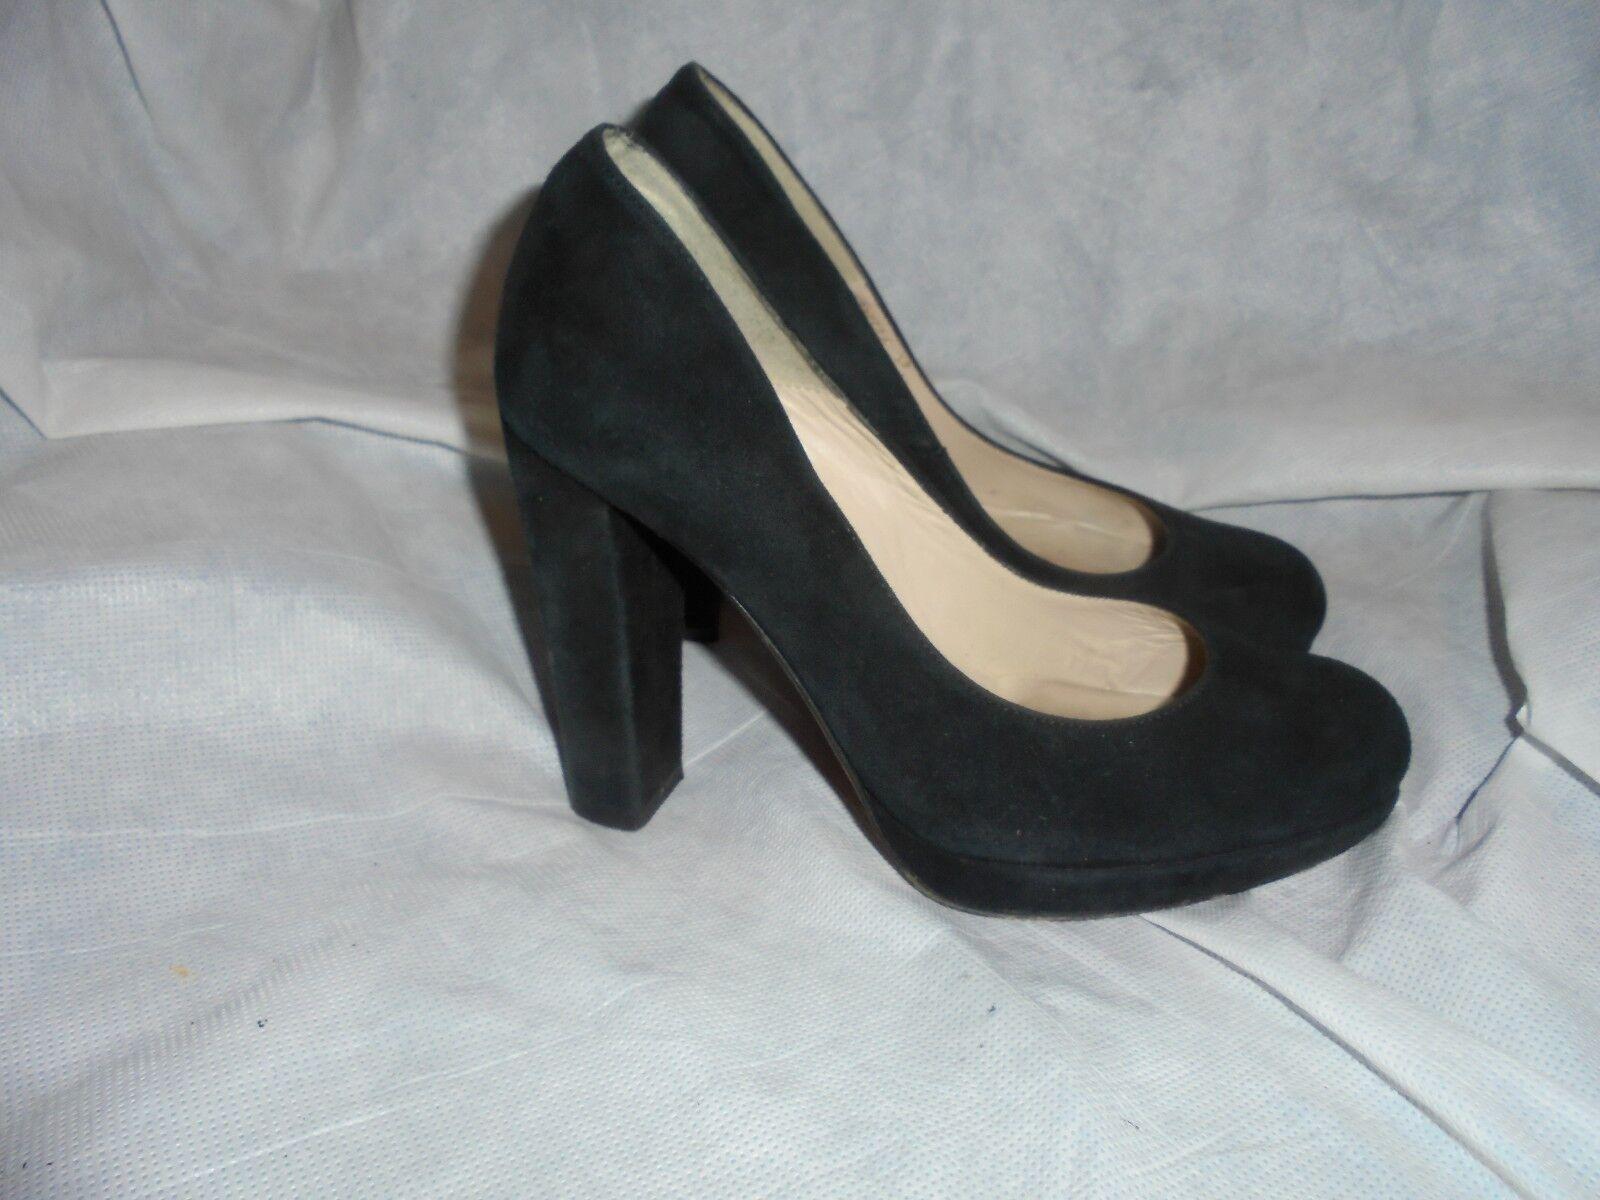 L.K. BENNETH femmes noir SUEDE LEATHER SLIP ON HEEL chaussures   Taille  UK 4 EU 37  VGC